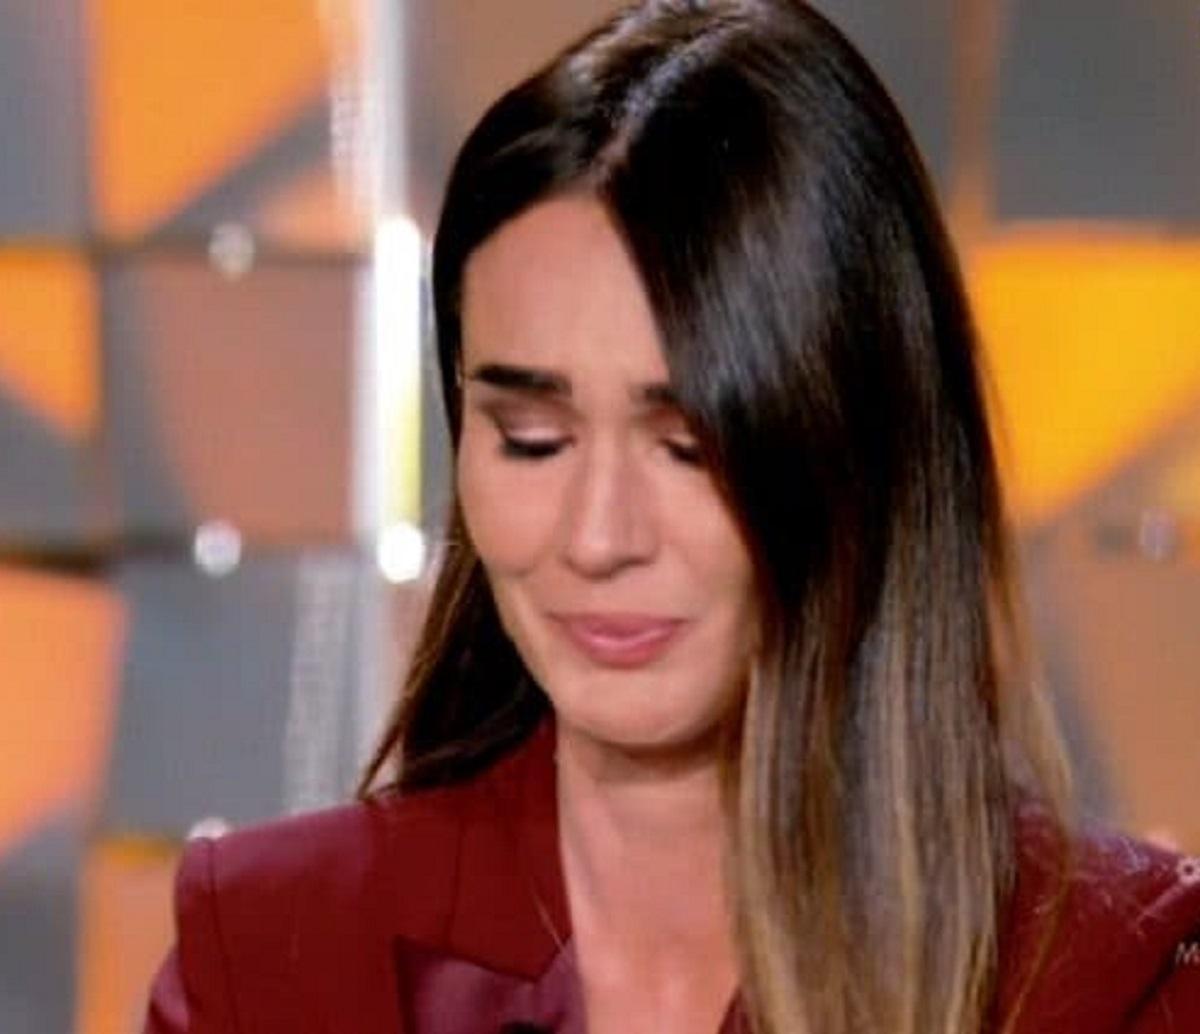 Silvia Toffanin racconto Pier Silvio Berlusconi racconto